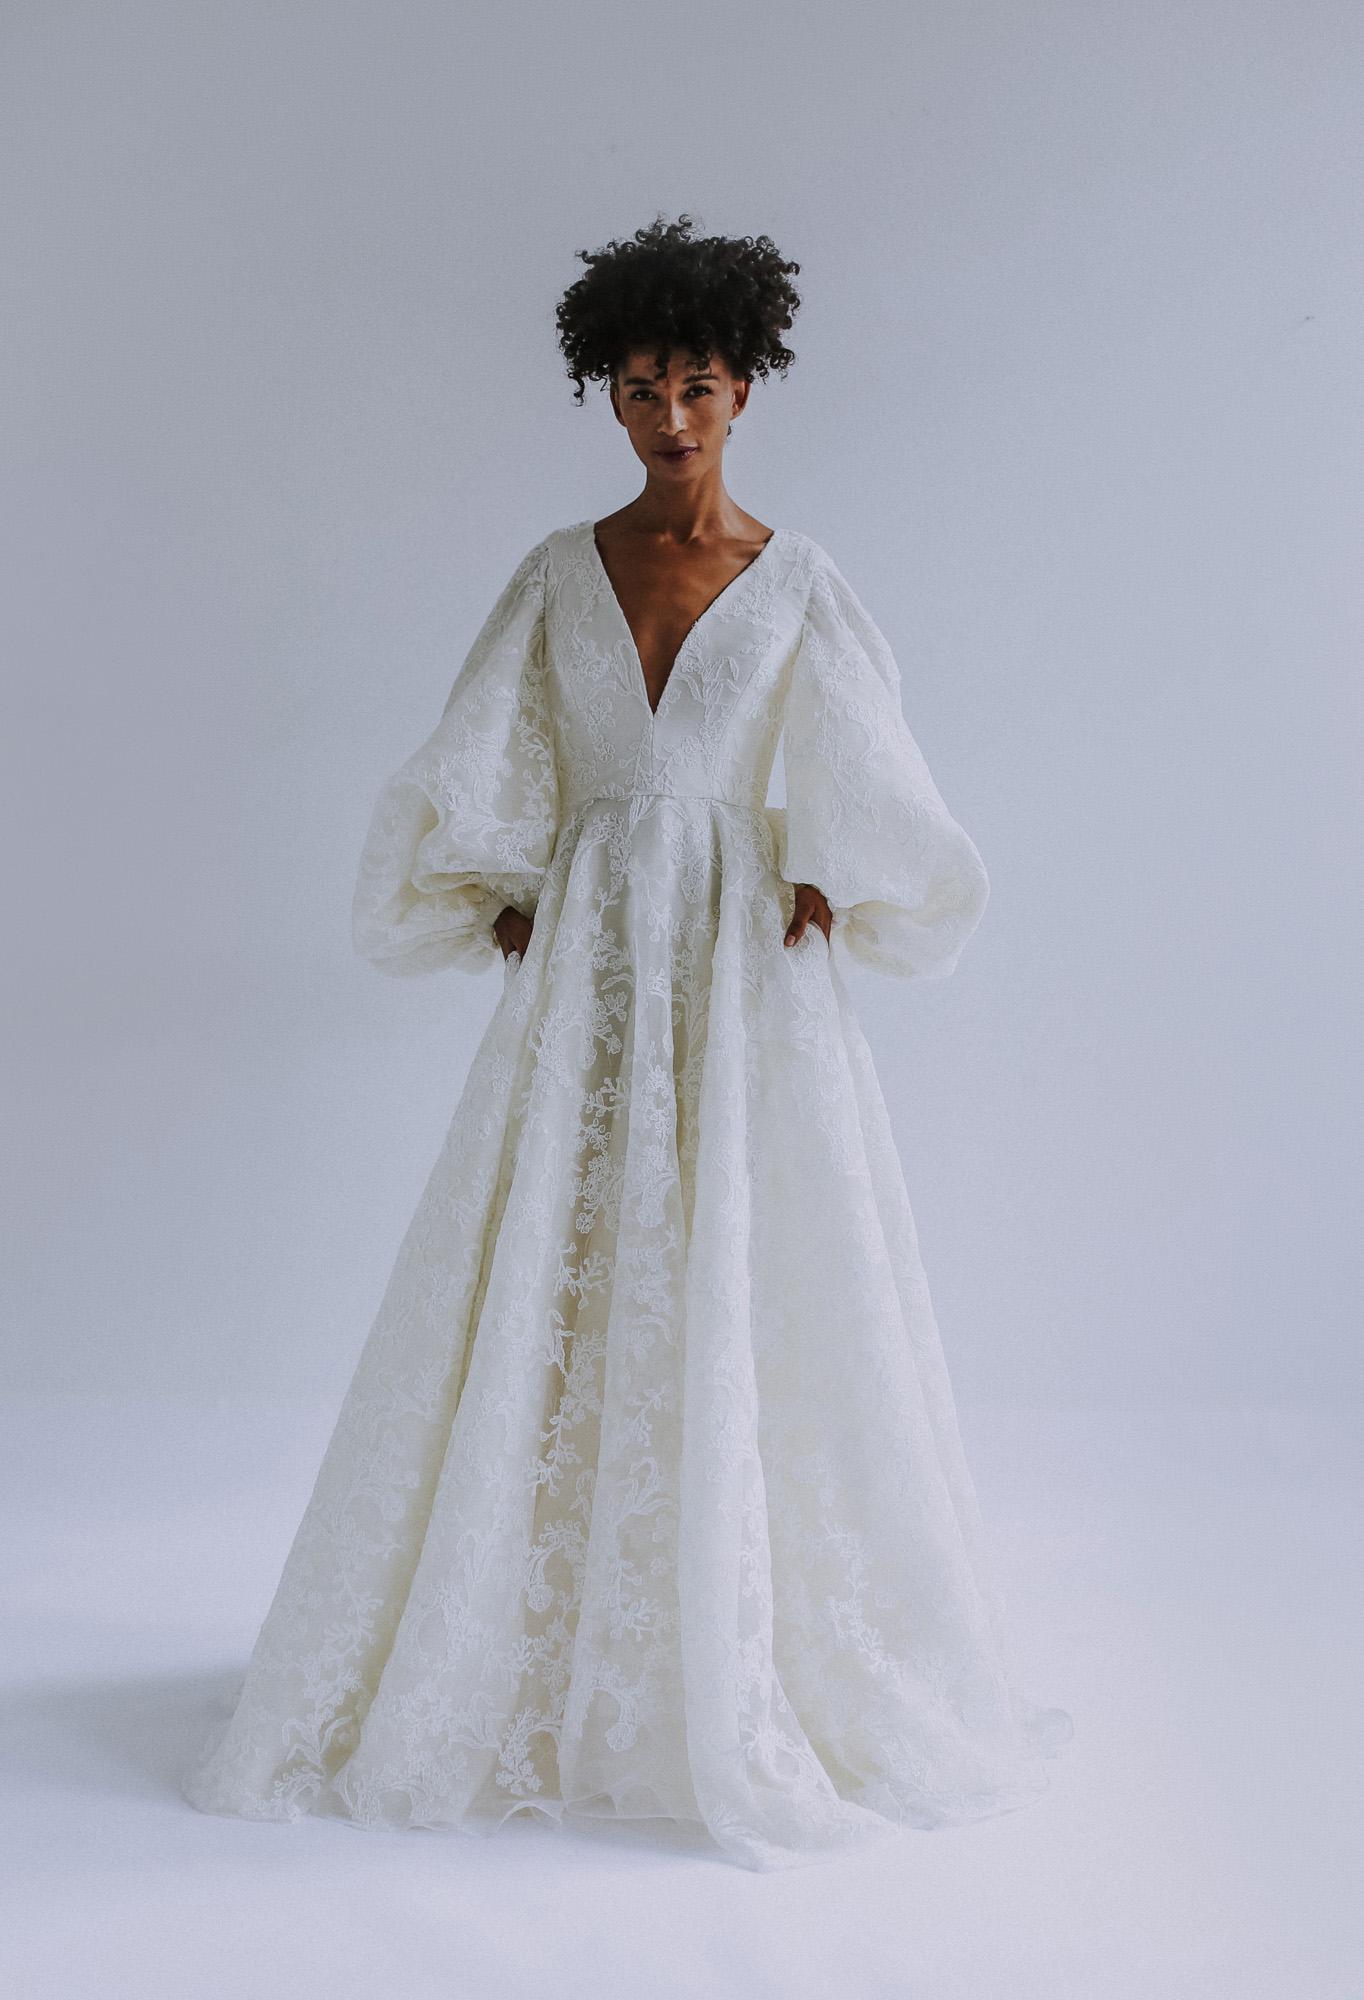 leanne-marshall-wedding-gown-4.jpg